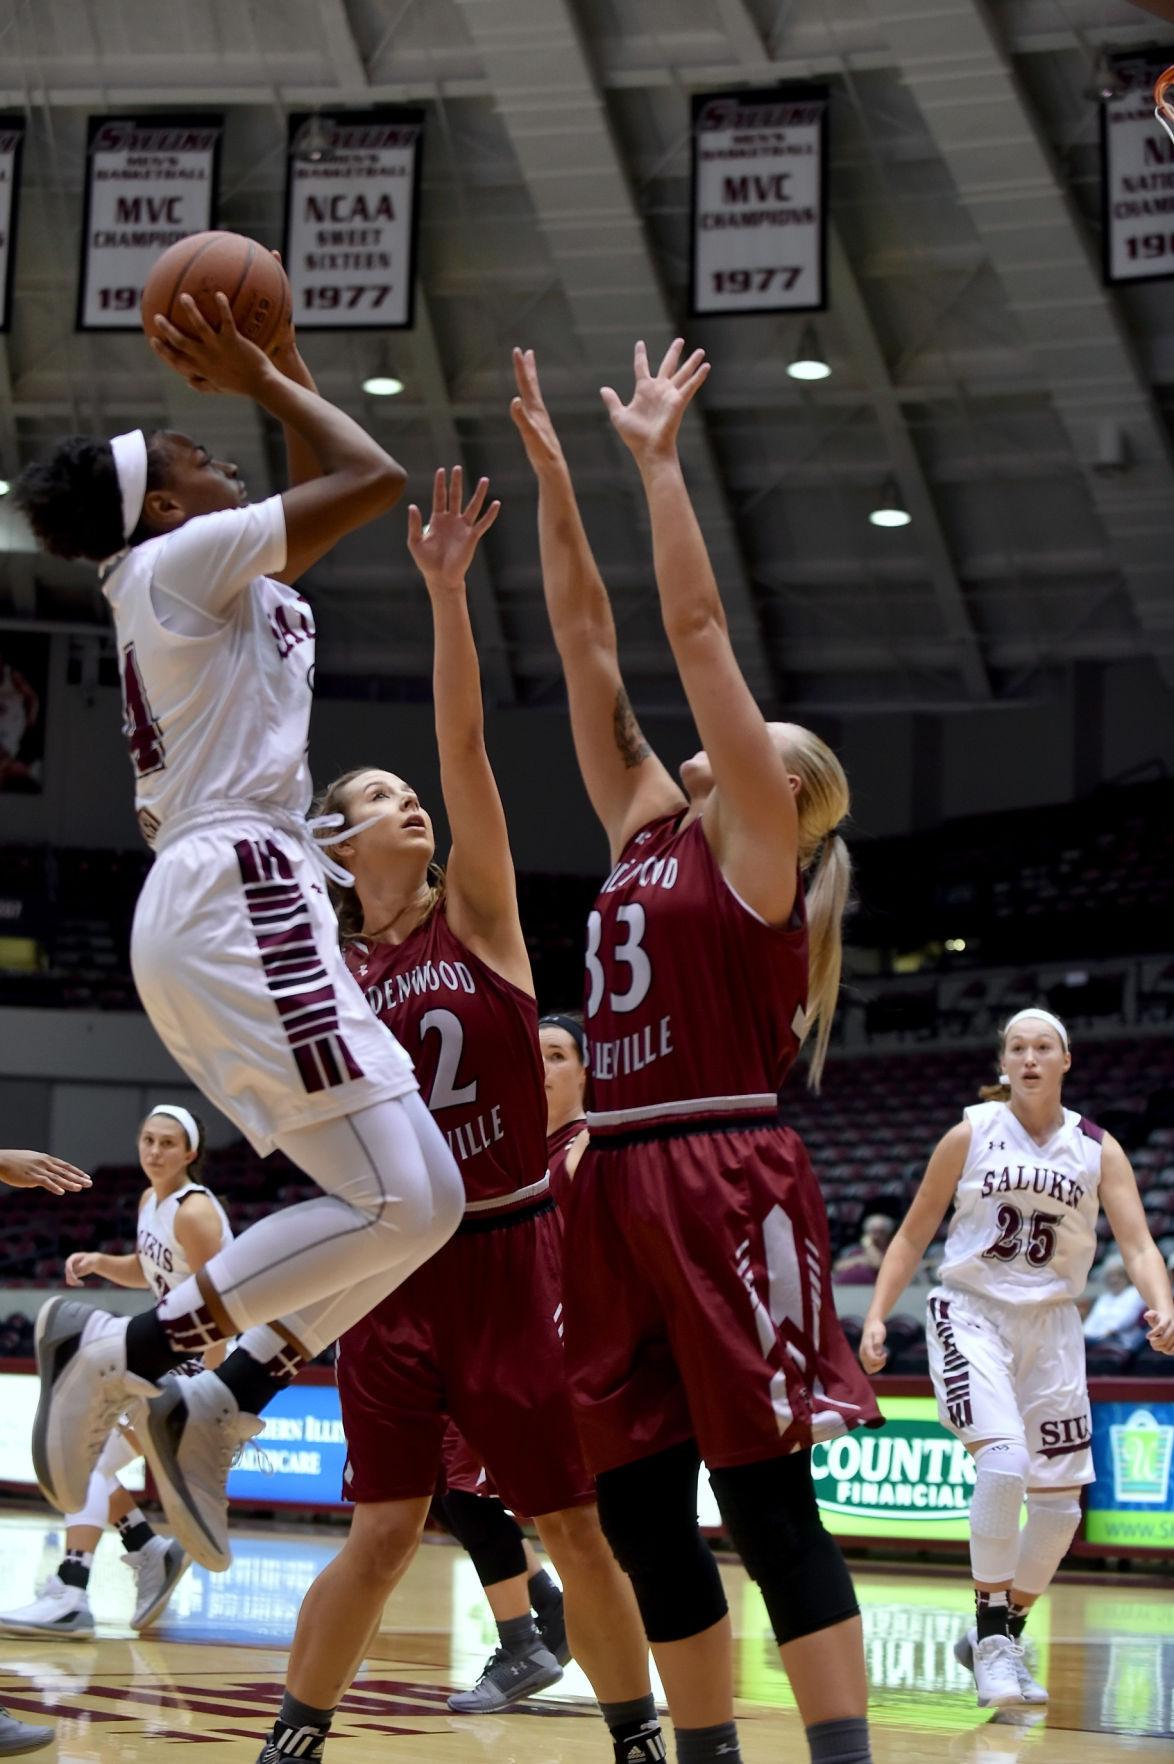 SIU Women's Basketball hosts Lindenwood-Belleville